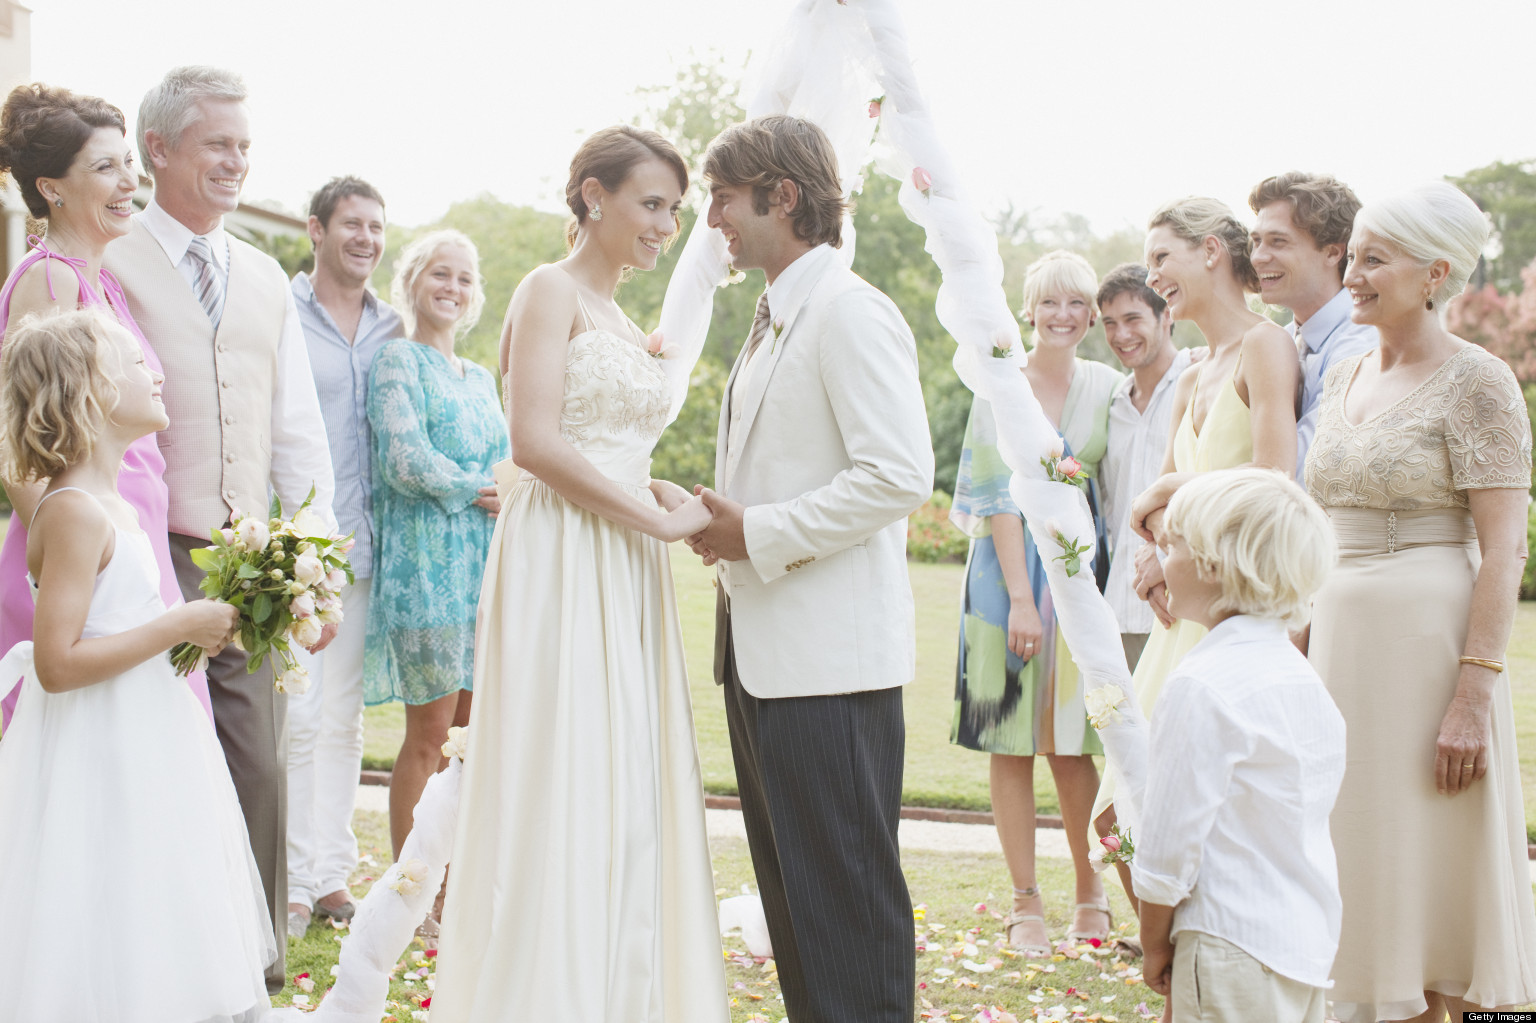 Outdoor Formal Wedding Attire